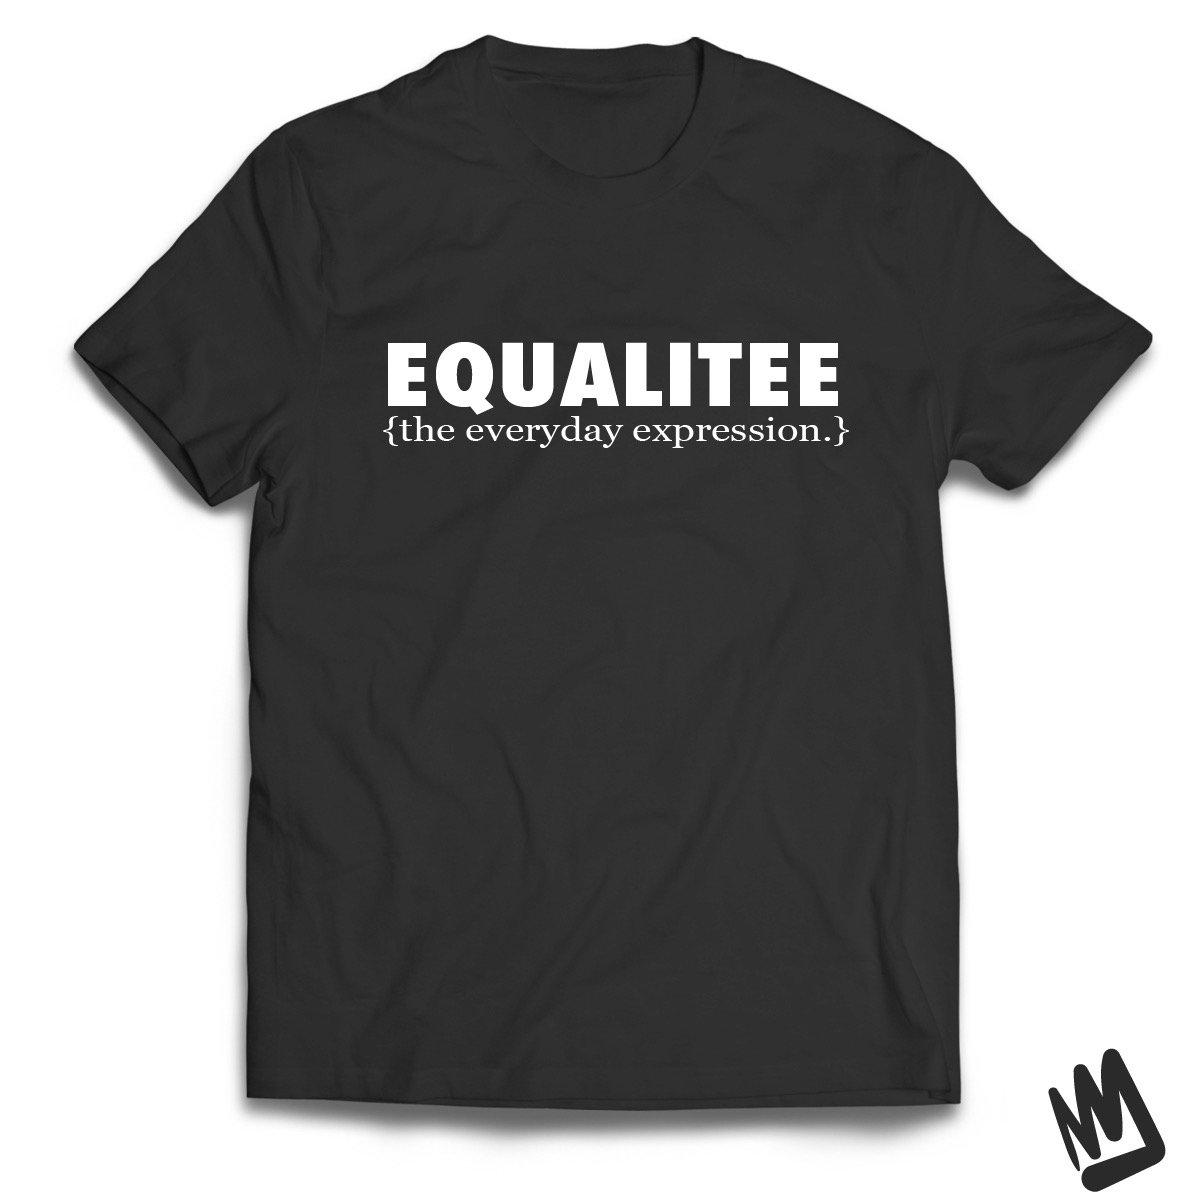 Image of EQUALITEE